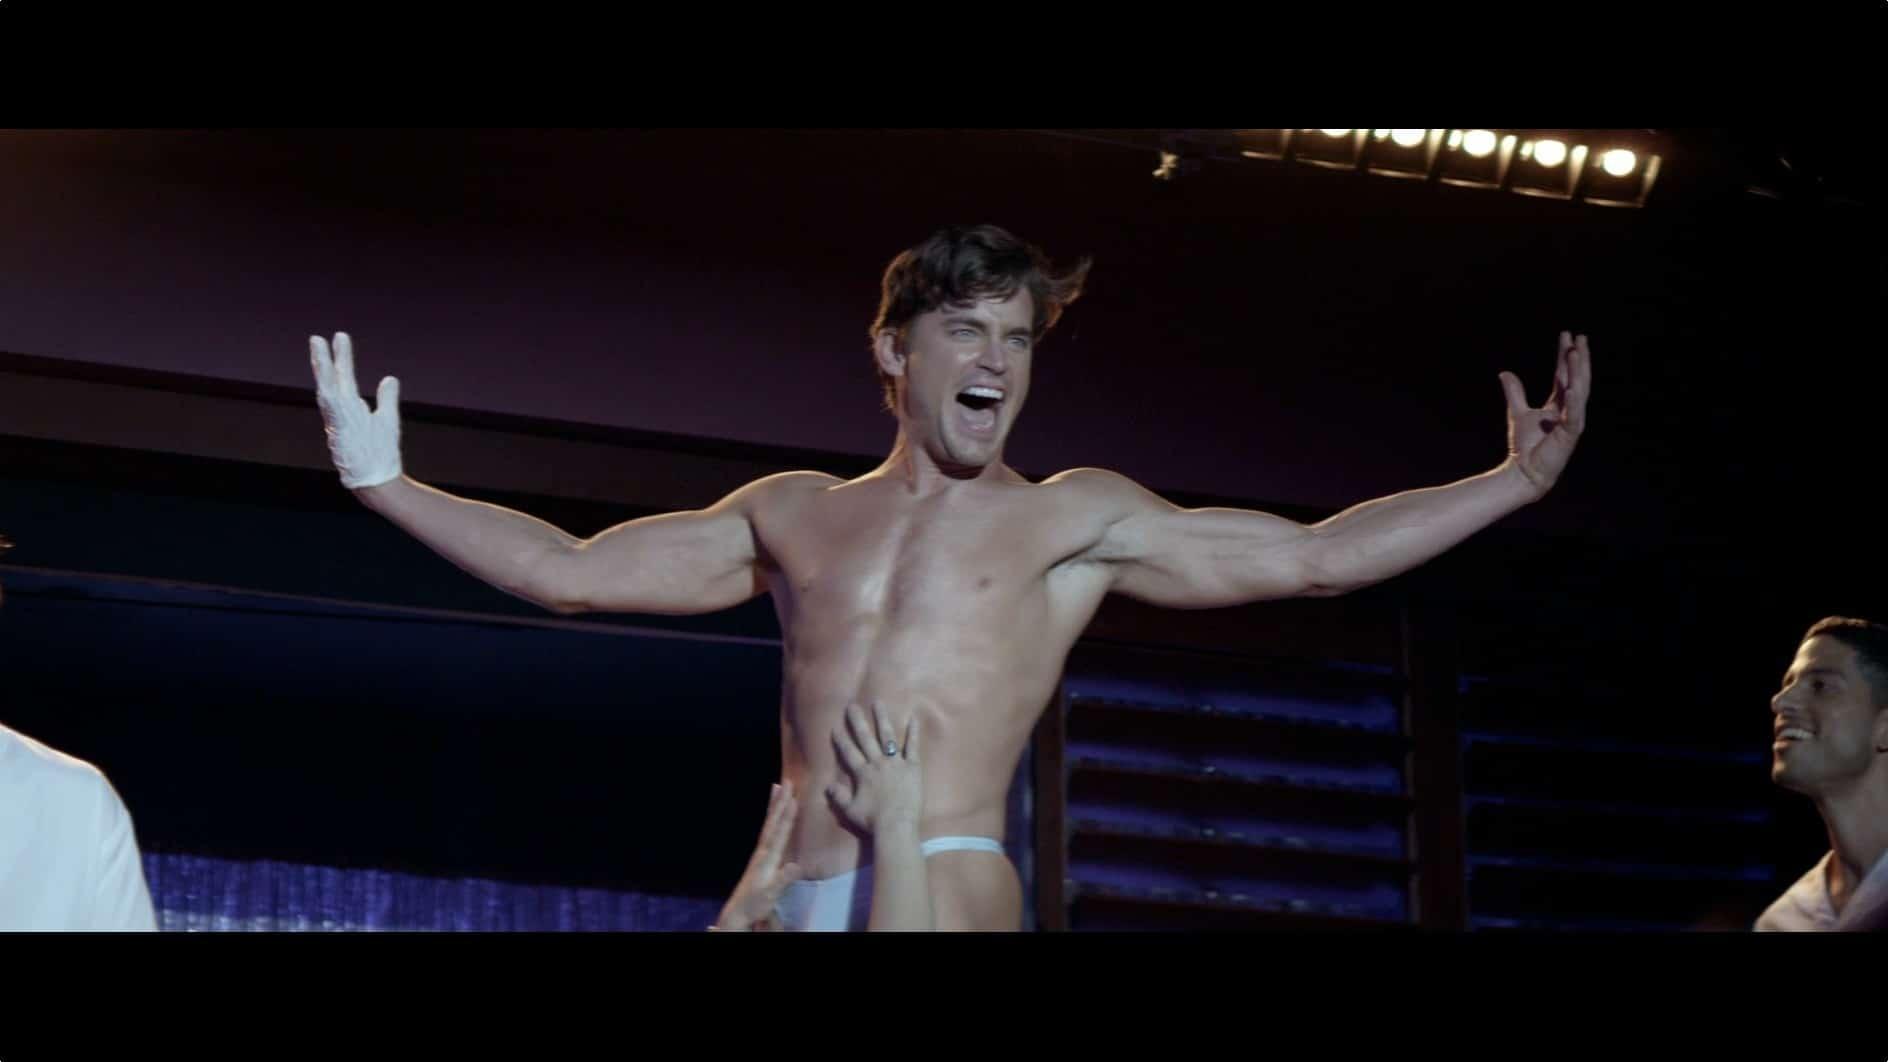 Matt Bomer gay stripper